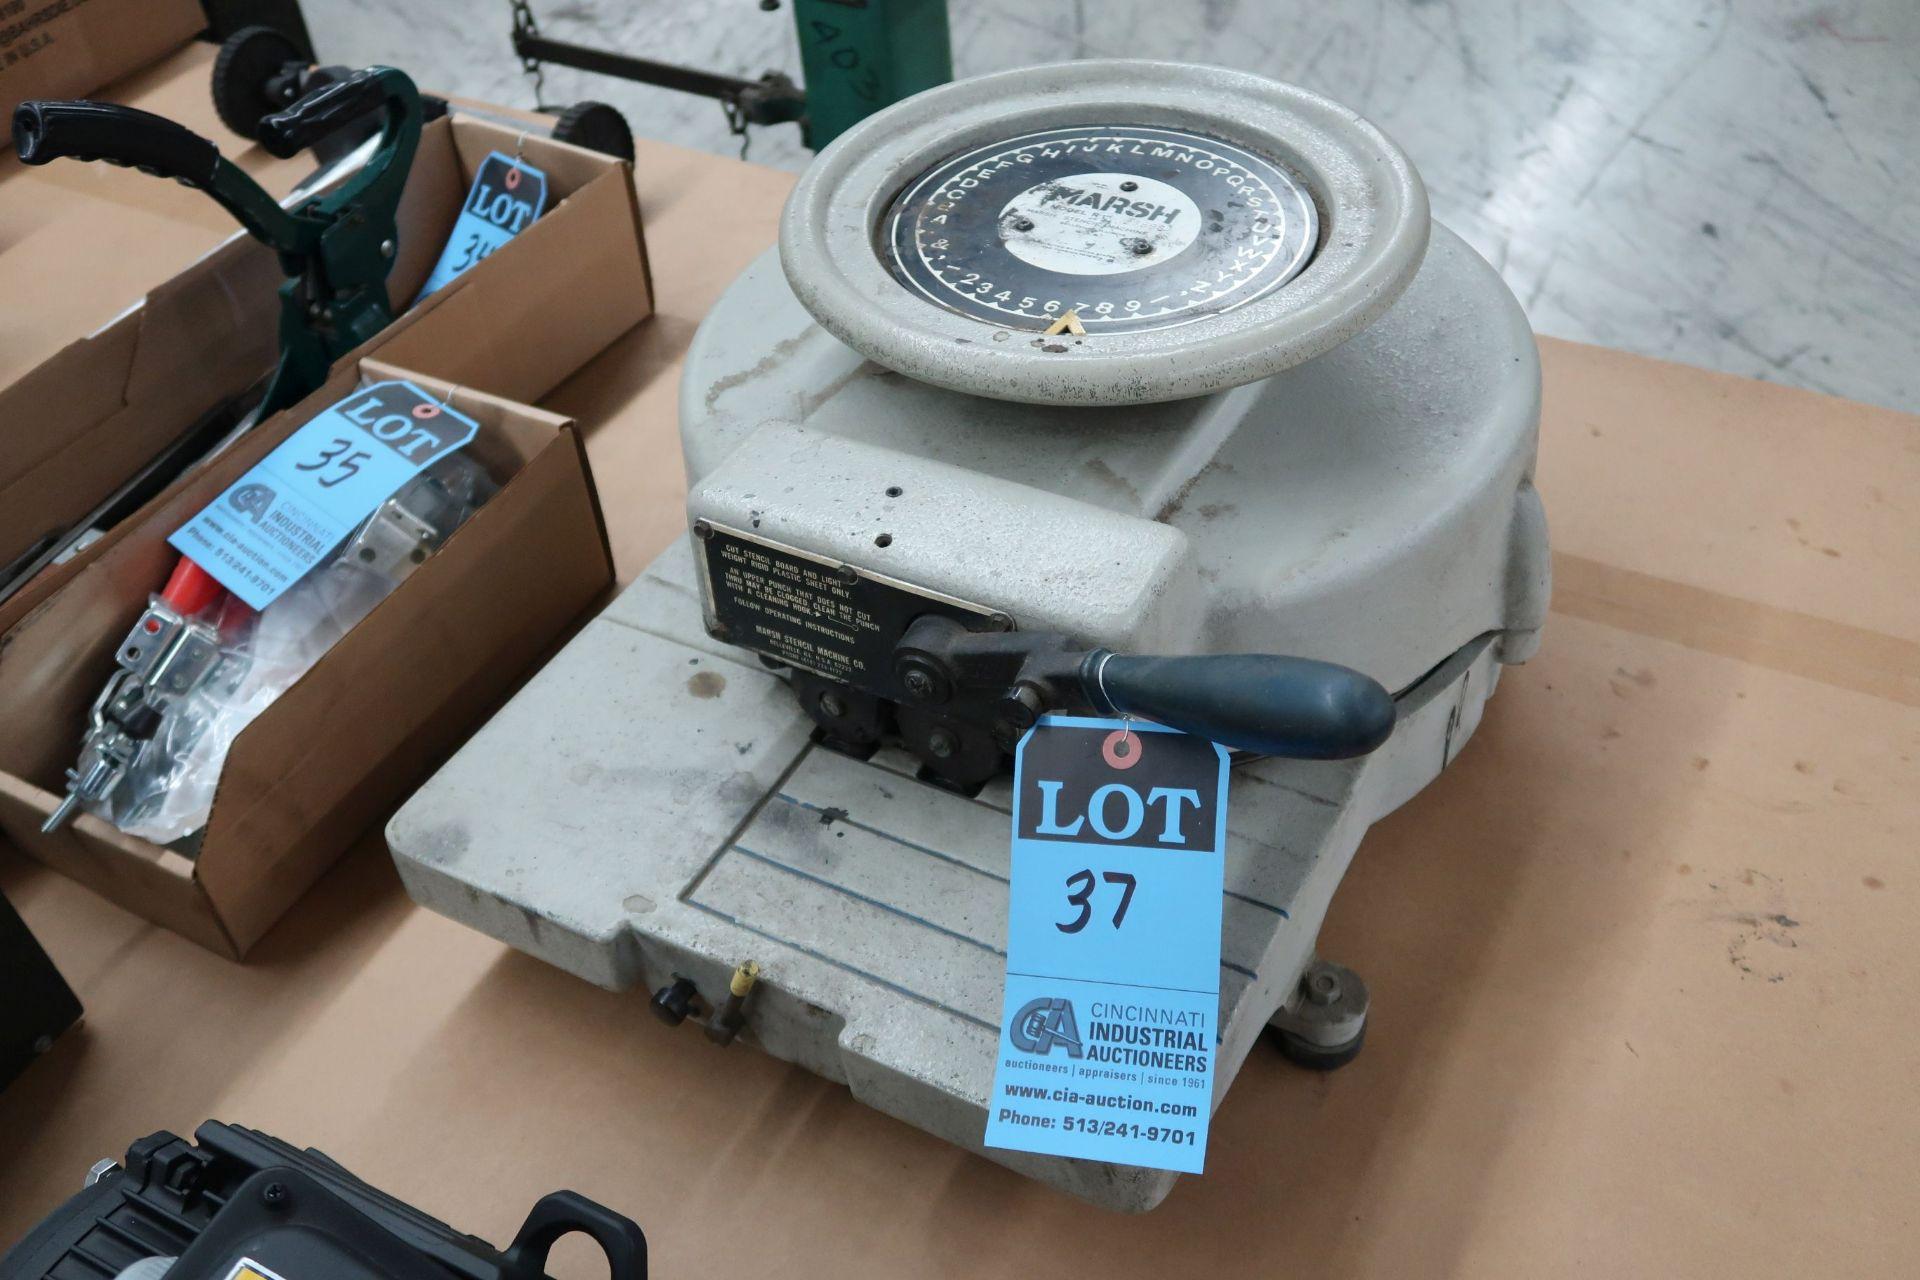 "MARSH MODEL R-1"" STENCIL MACHINE; S/N 23898"